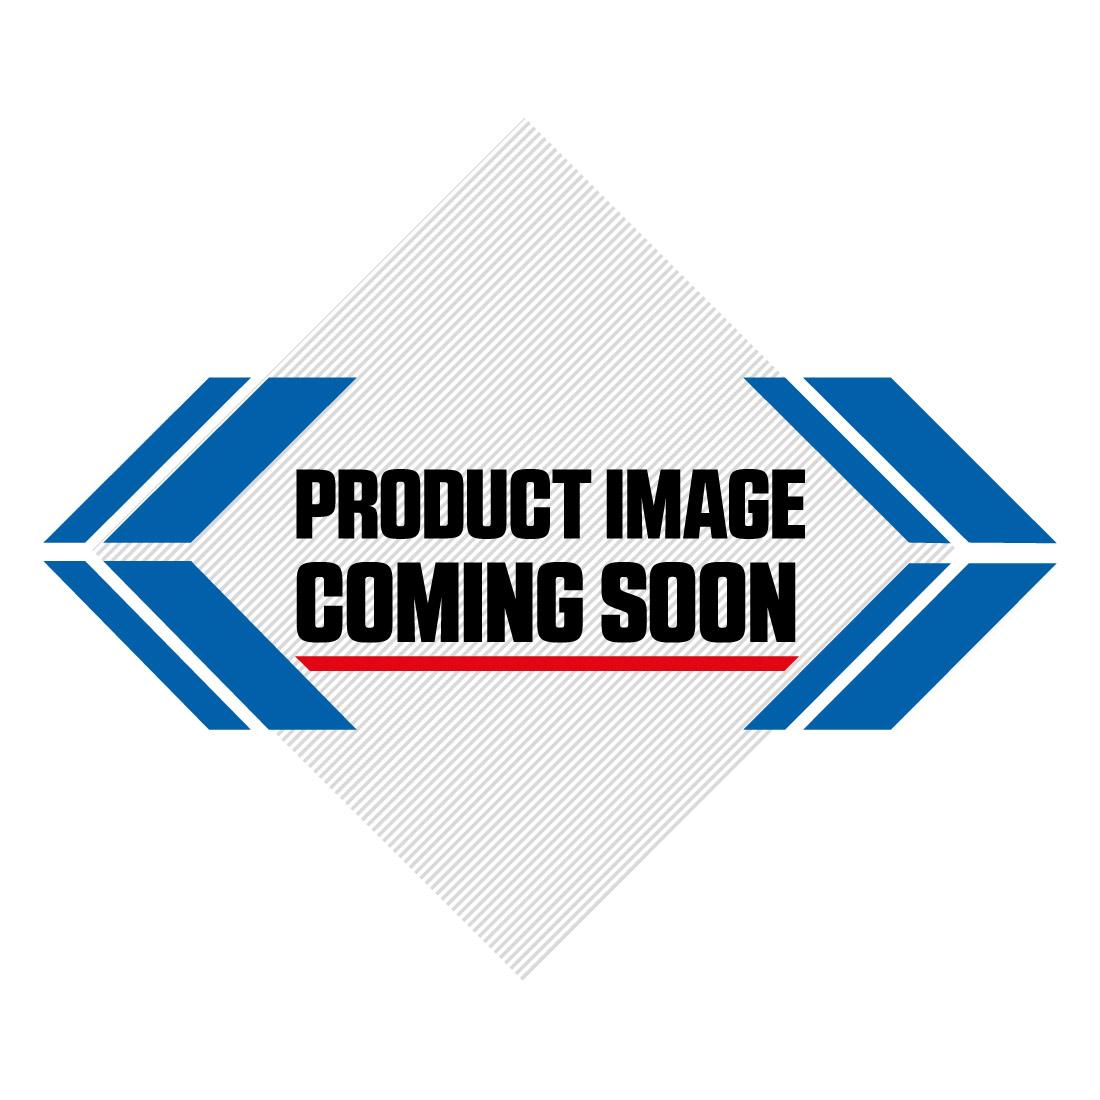 Kawasaki Restyled Plastic Kit KX 85 (01-09) (11-12) OEM Factory Image-2